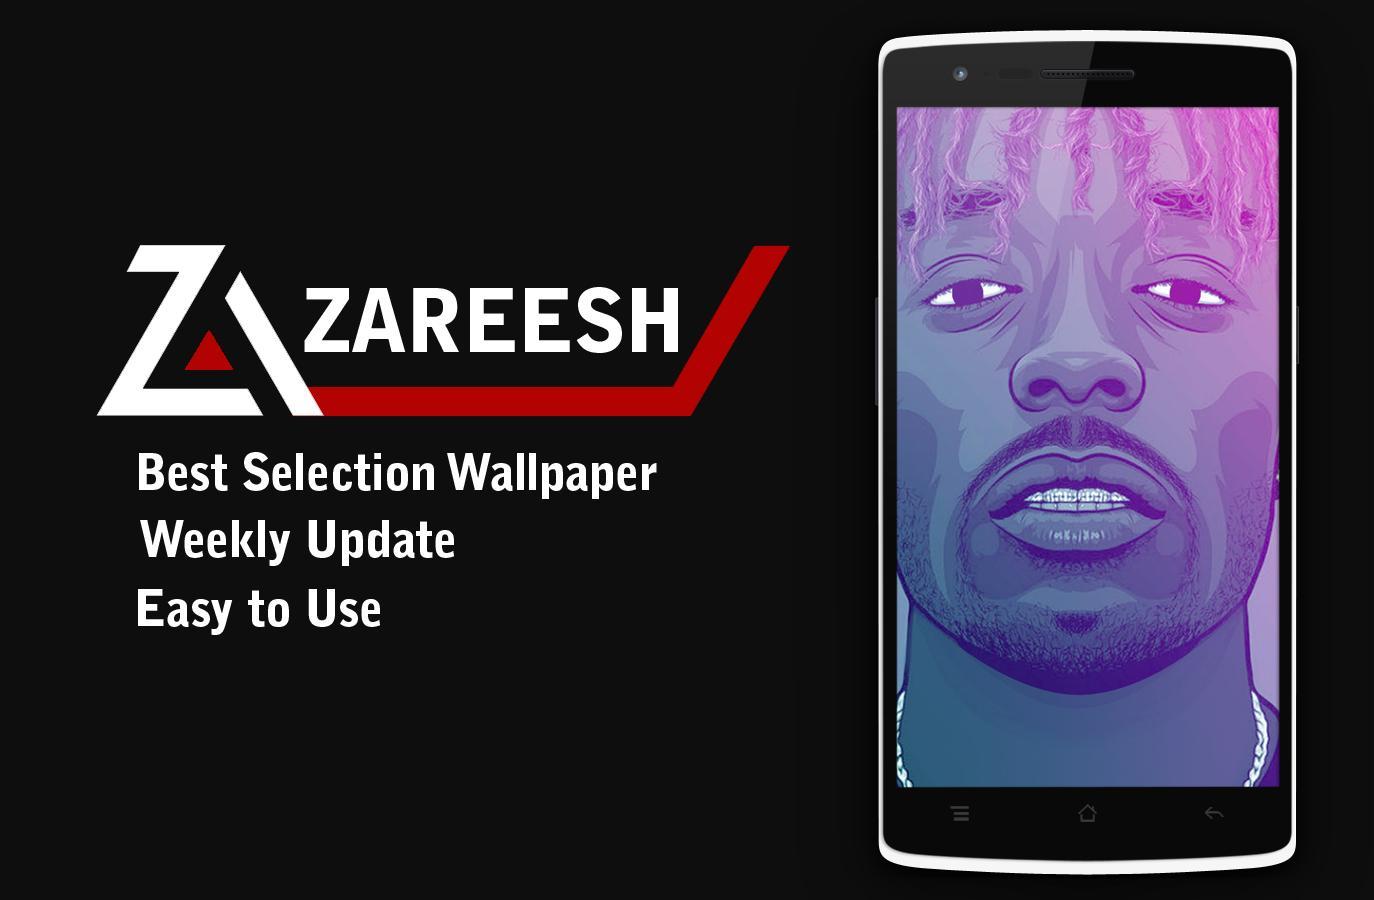 Lil Uzi Vert Wallpapers Hd Zareesh For Android Apk Download Download the perfect lil uzi vert pictures. lil uzi vert wallpapers hd zareesh